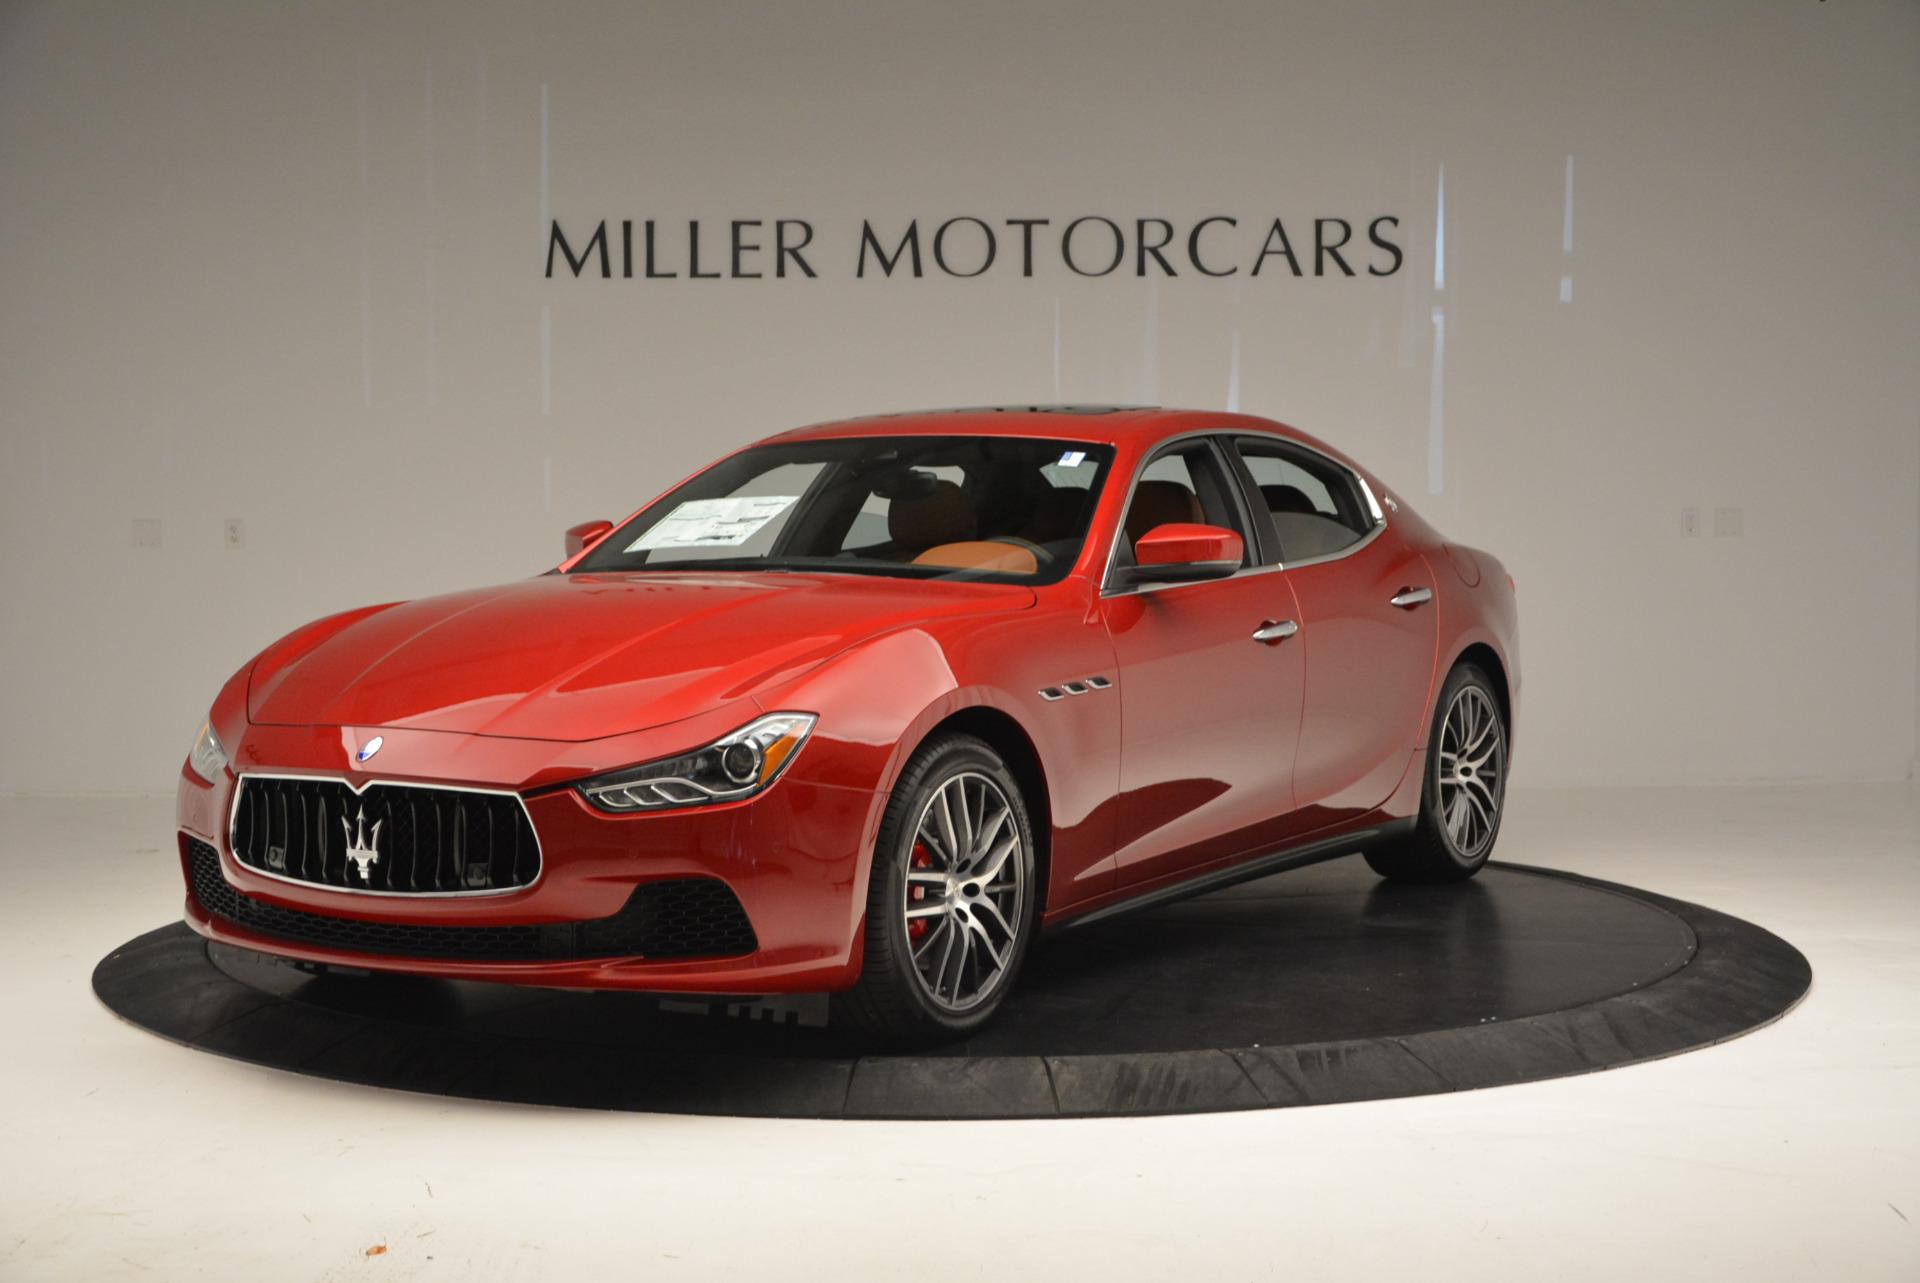 New 2017 Maserati Ghibli S Q4 For Sale In Greenwich, CT 579_main